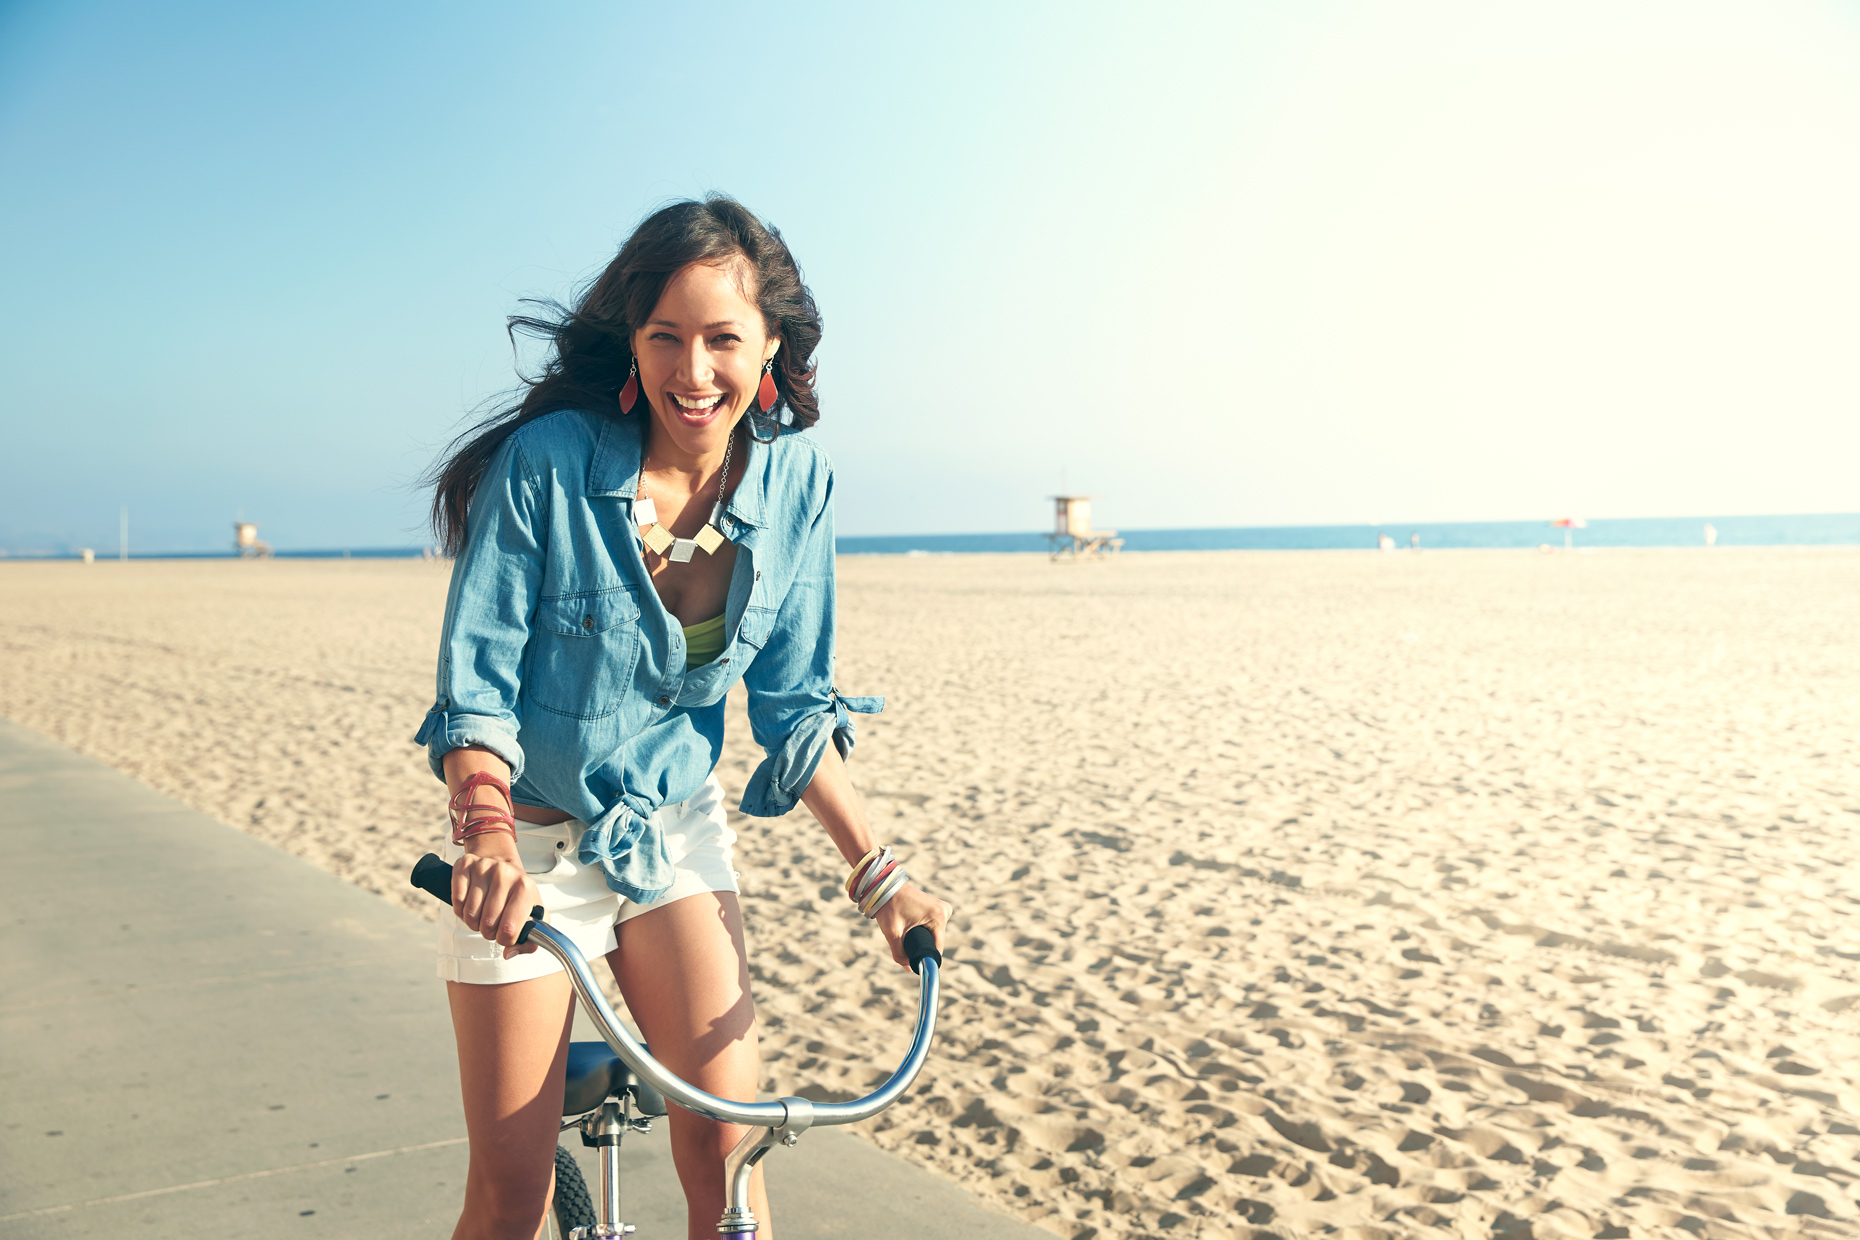 Lifestyle photography Derek Israelsen Girl Bike Beach